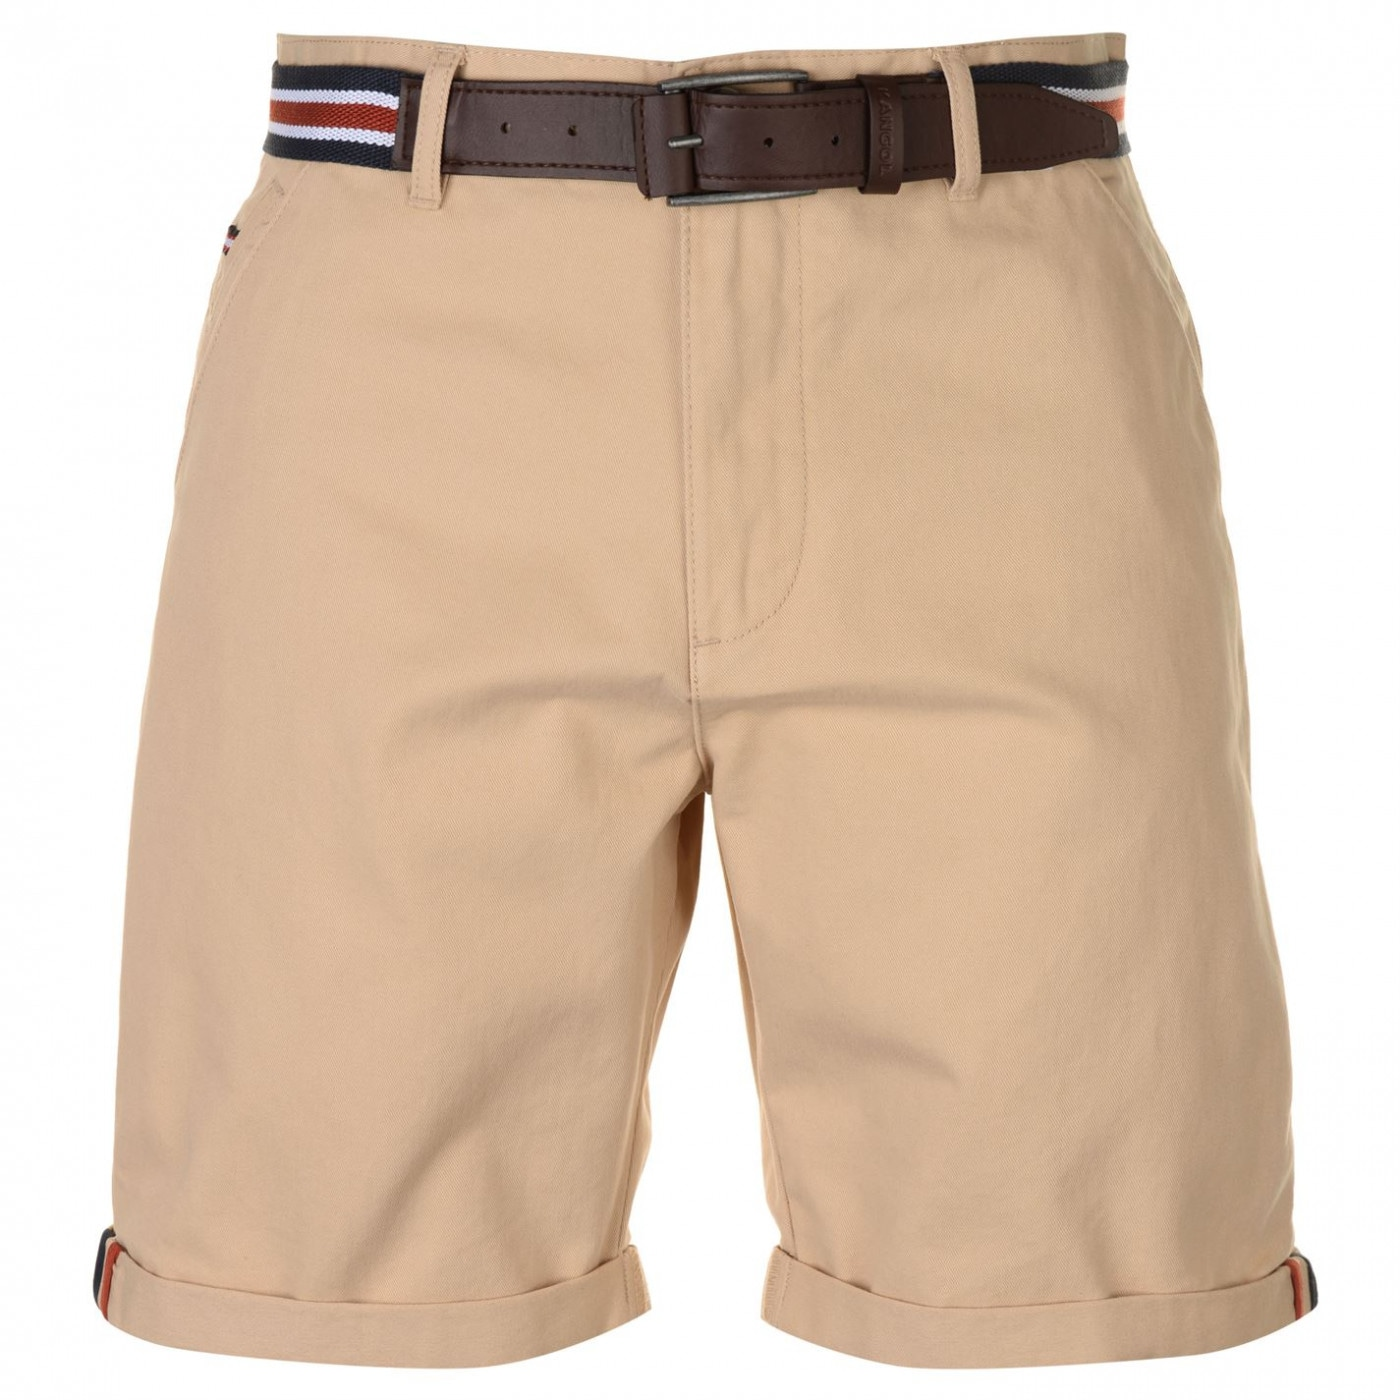 Kangol Belted Shorts Mens